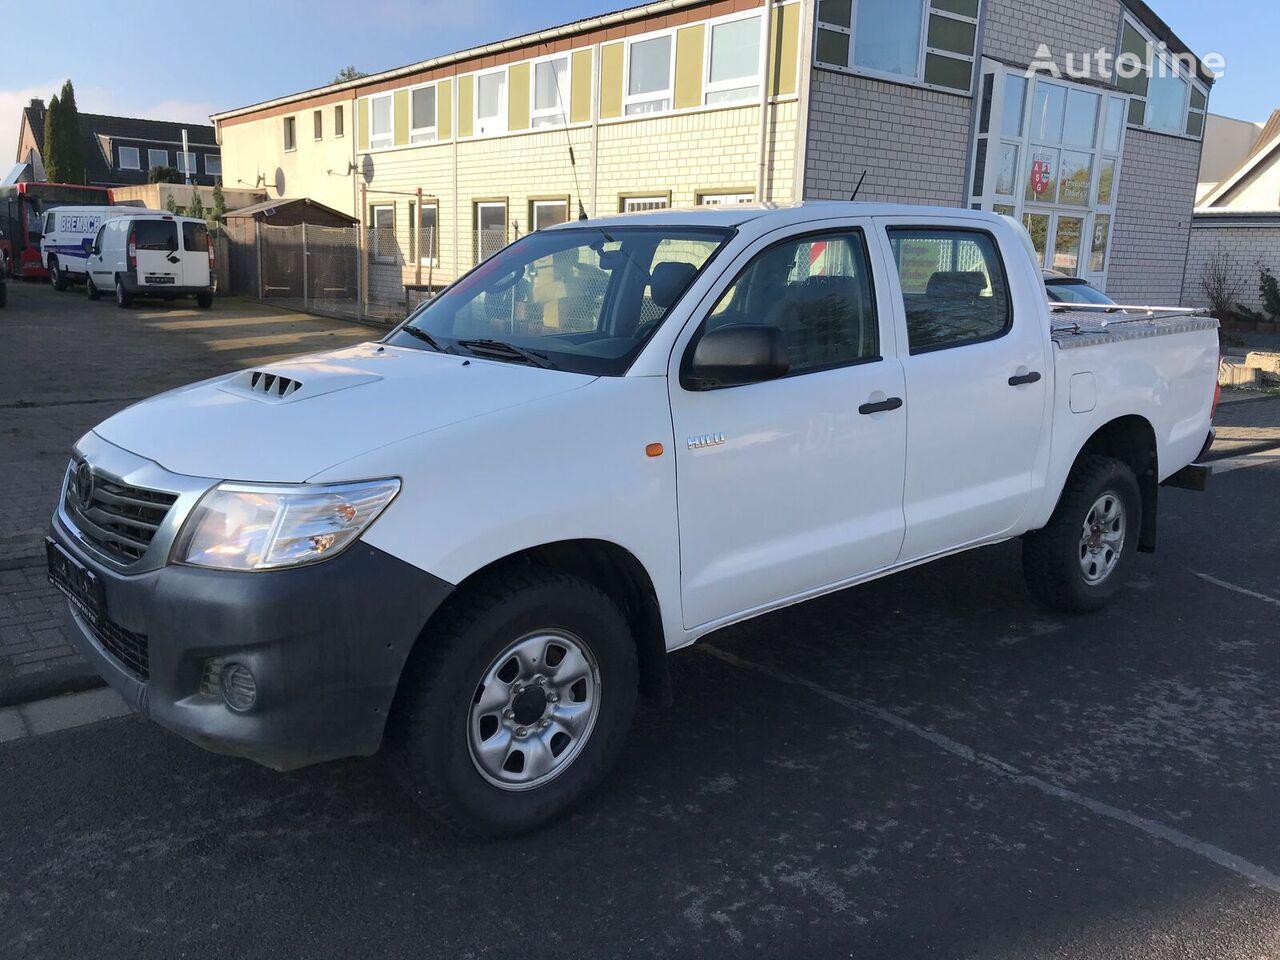 TOYOTA Hilux 4x4 Double Cab DPF MwSt VAT Klima AC 142.000km pick-up